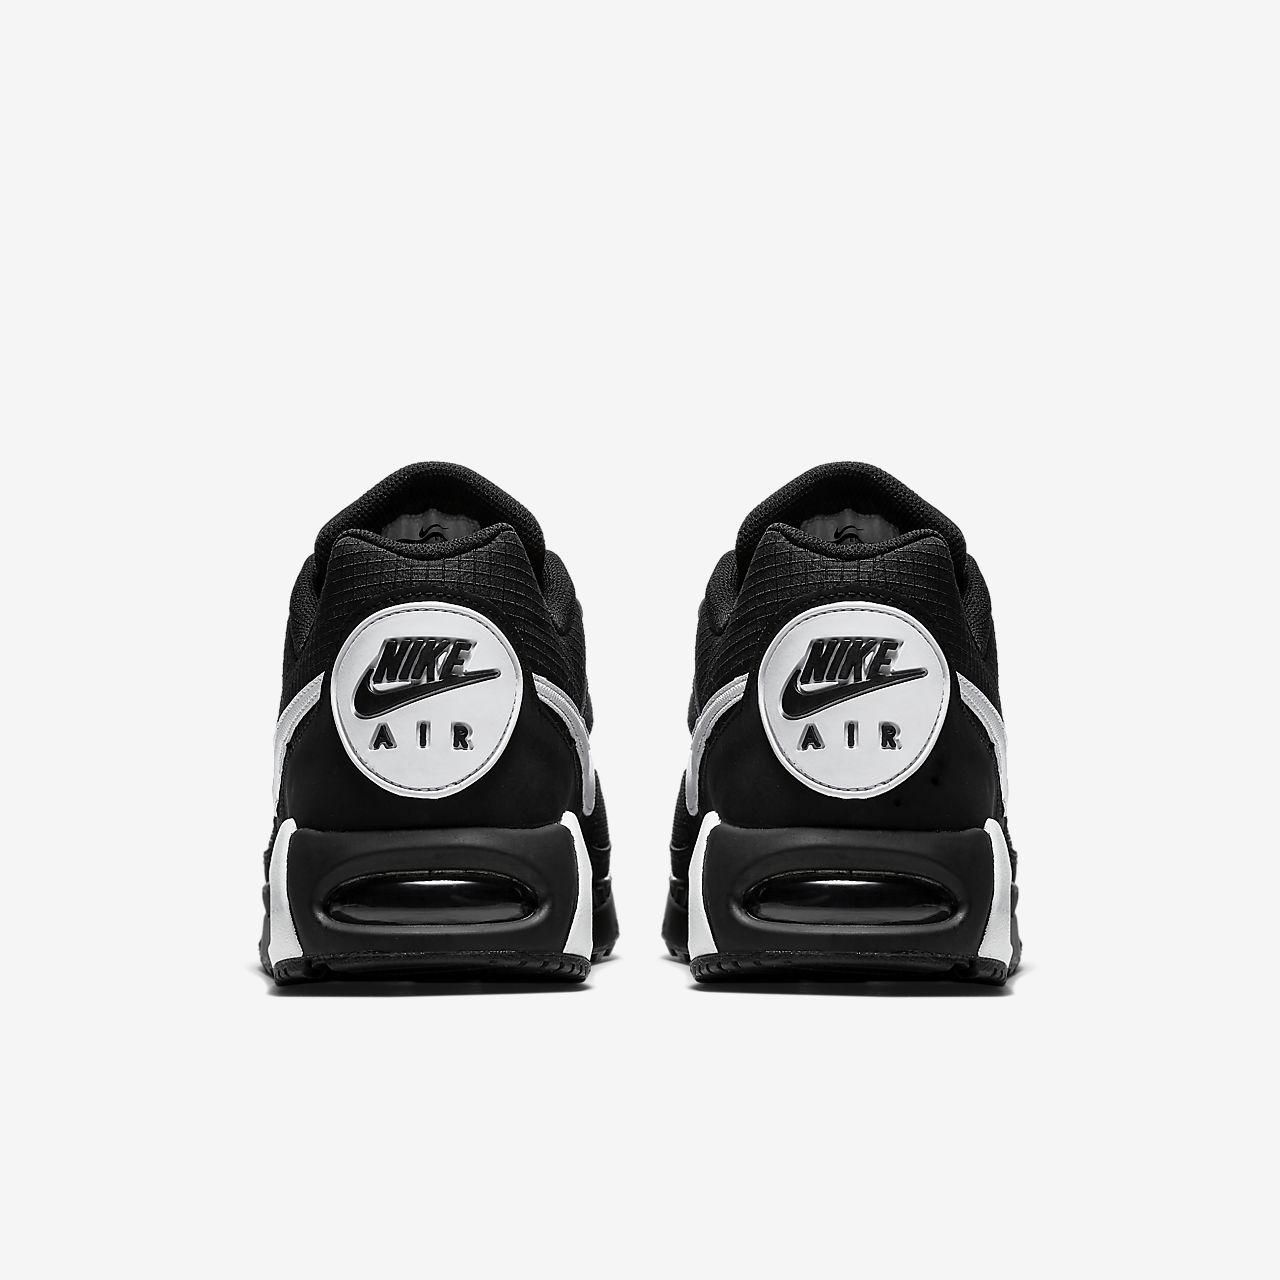 hot sale online b4159 f67e1 Chaussure Nike Air Max IVO pour Homme. Nike.com FR